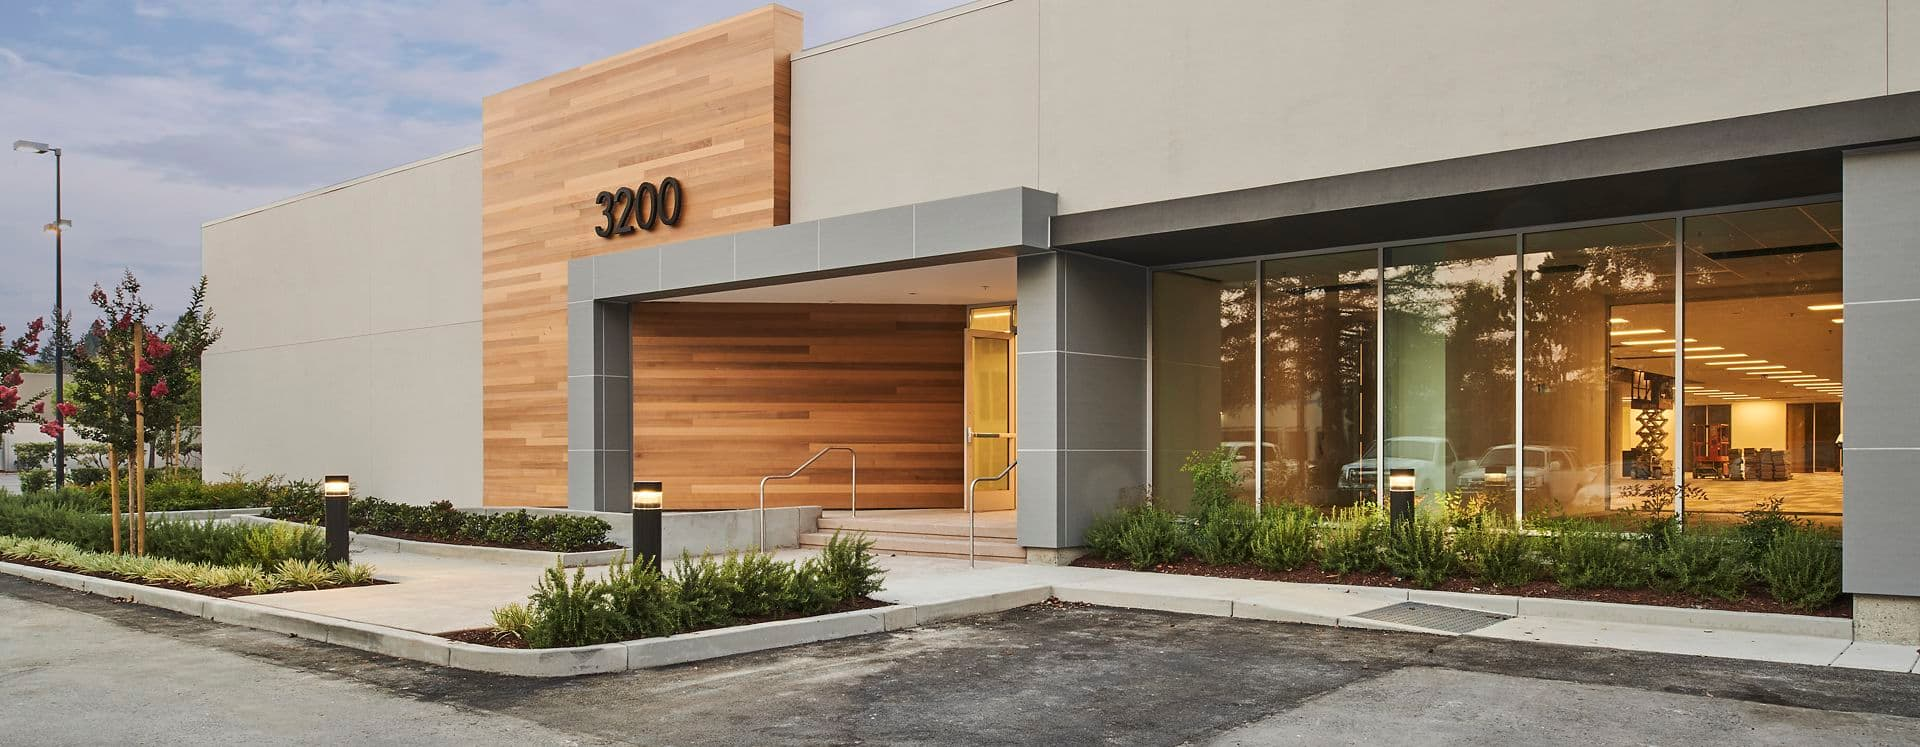 Exterior view of 3200 Coronado Drive at Coronado Park @ The Square.